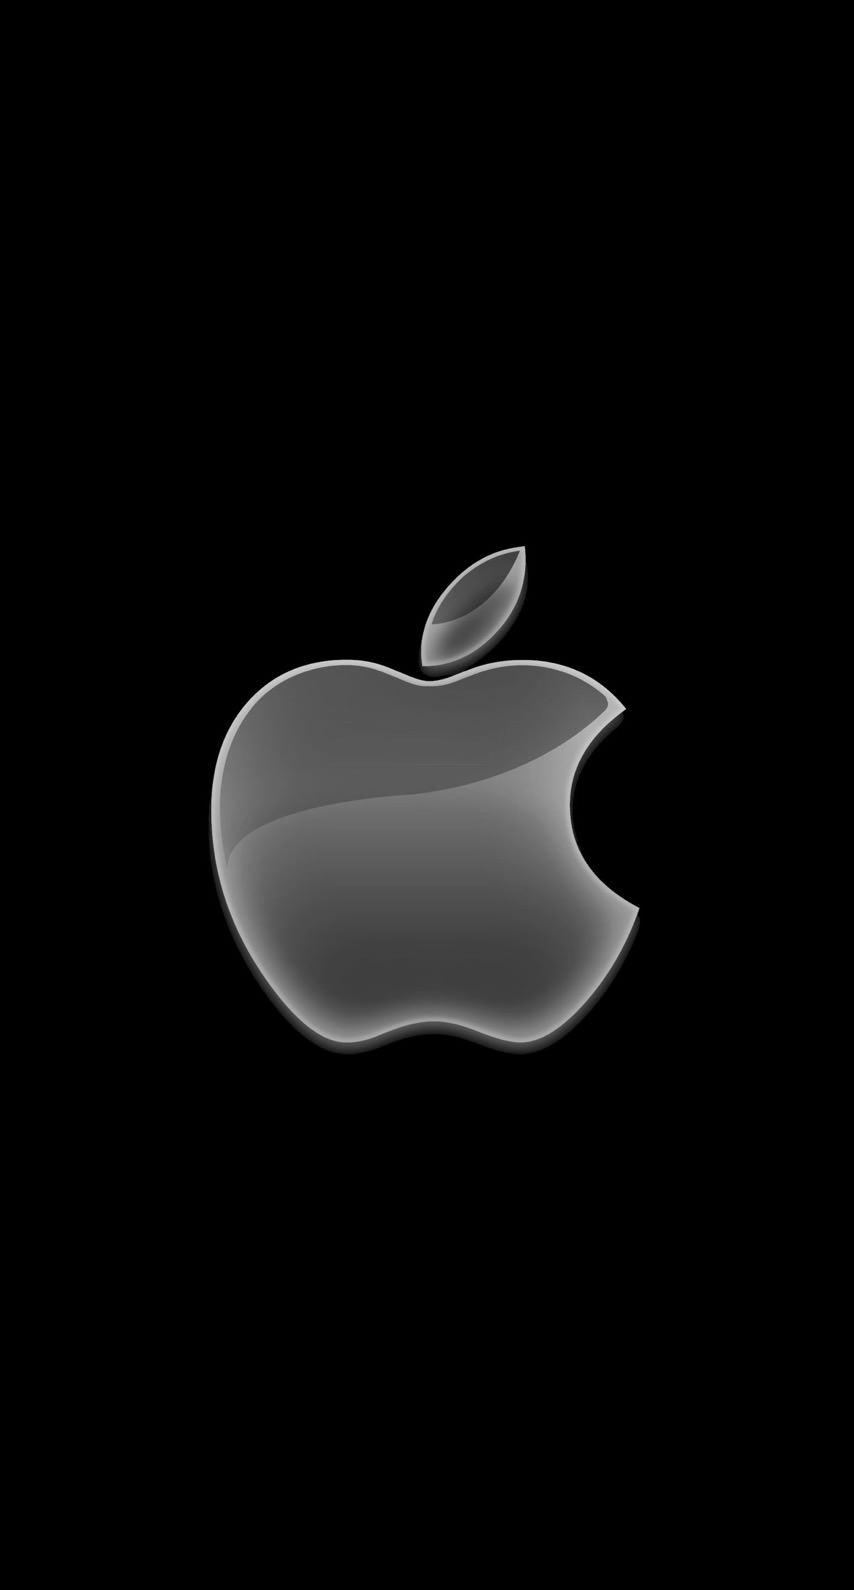 Appleロゴ黒クールの iPhone6s / iPhone6 壁紙